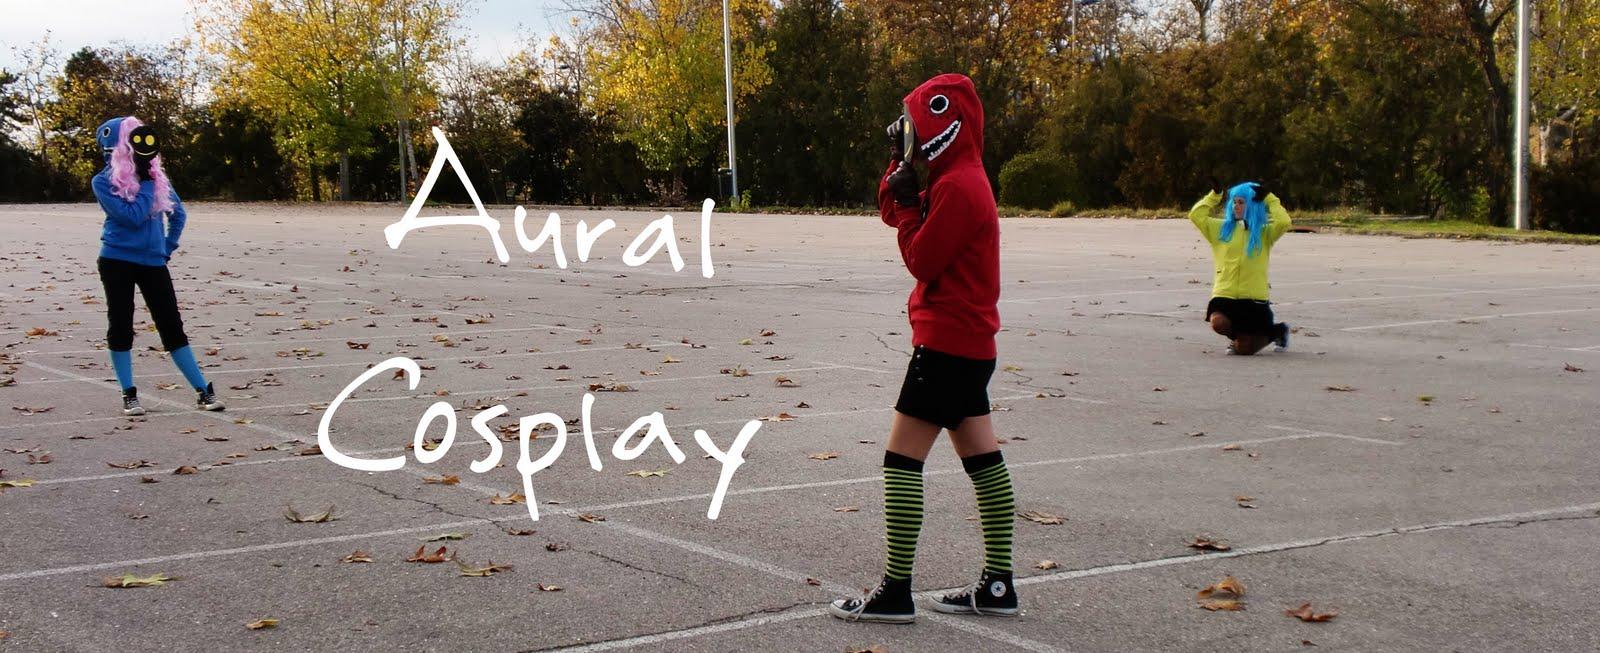 Aural Cosplay